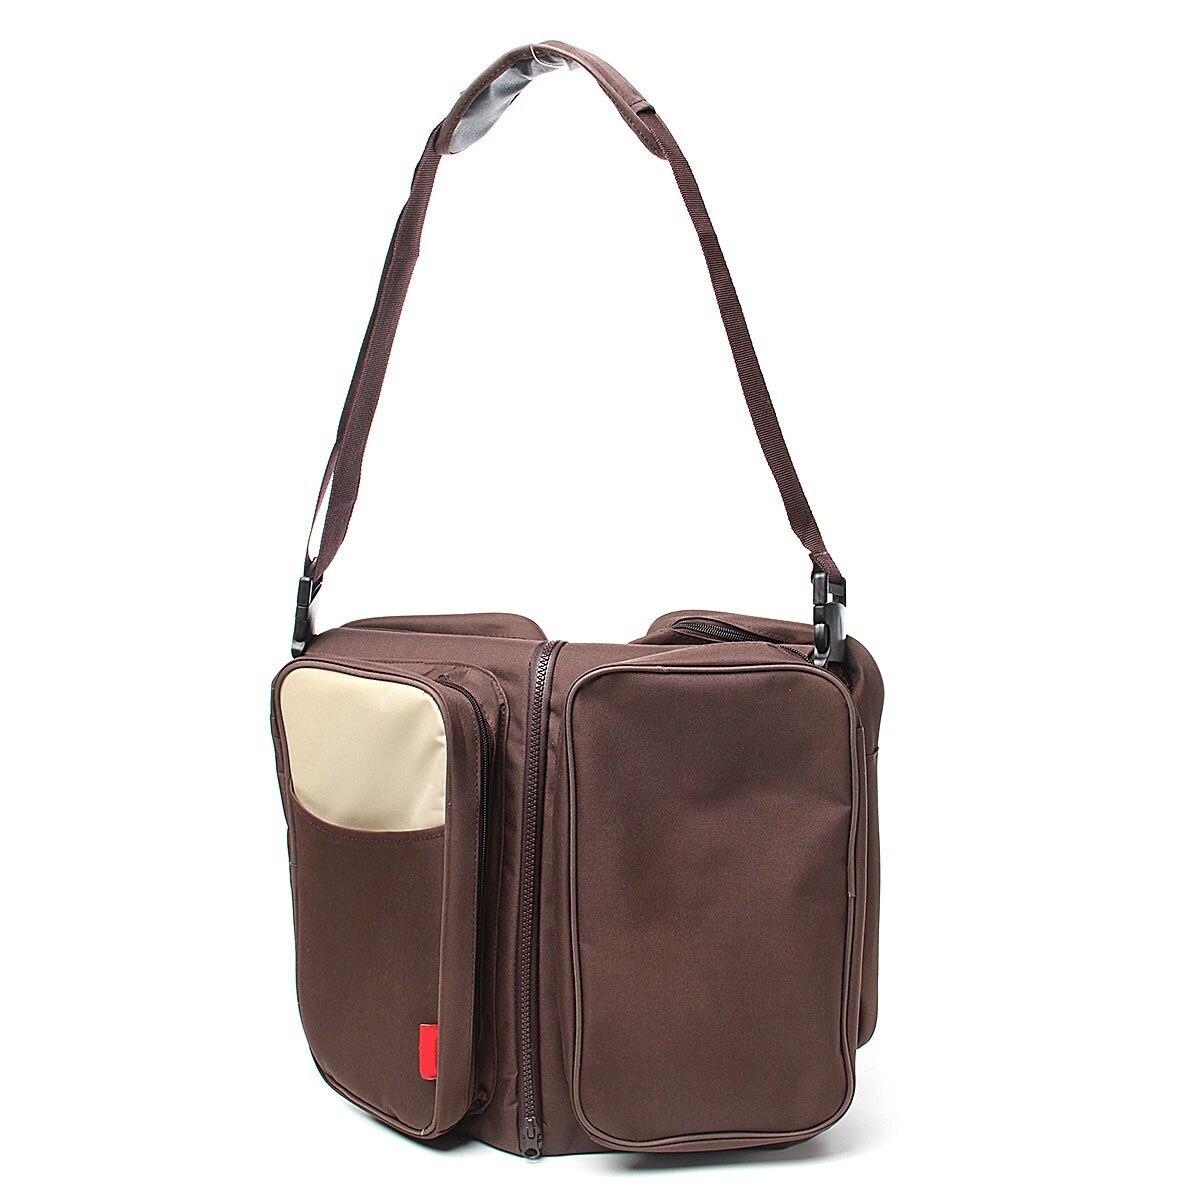 2in1 Crib Bassinet Large Maternity Single Stroller Backpack Multi-functional Breathable Nursing bag Baby Diaper Bag Nappy Change